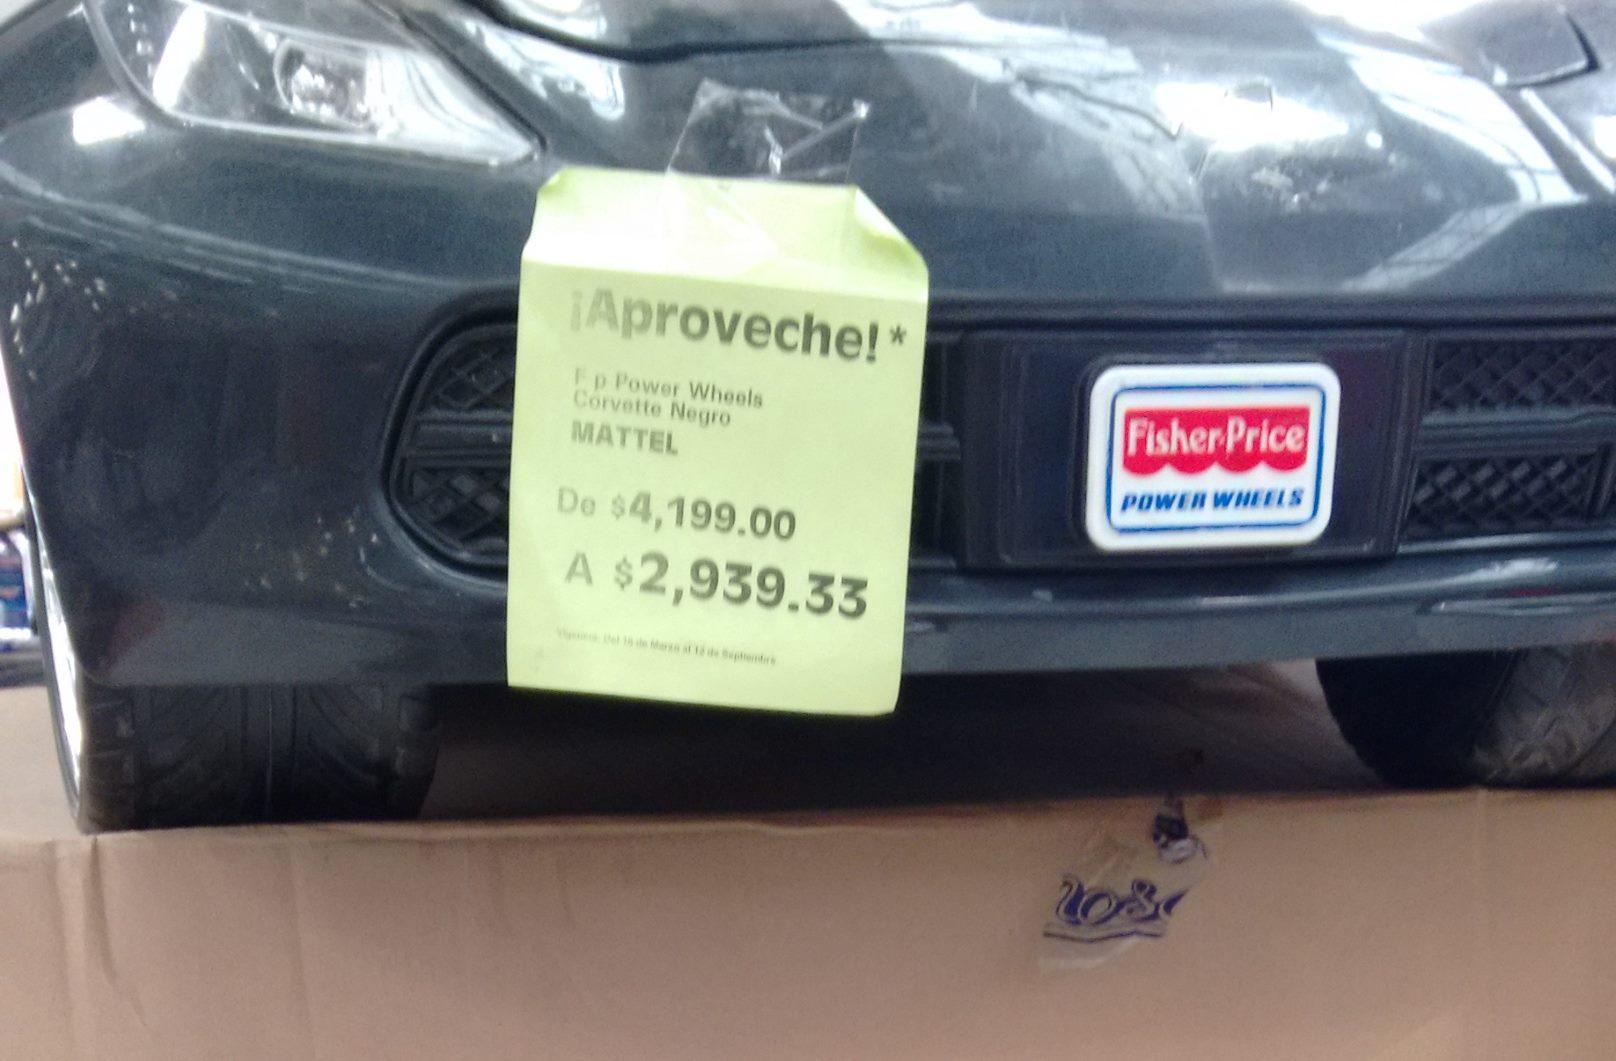 La Comer: Power Wheels Corvette Negro a $2,939